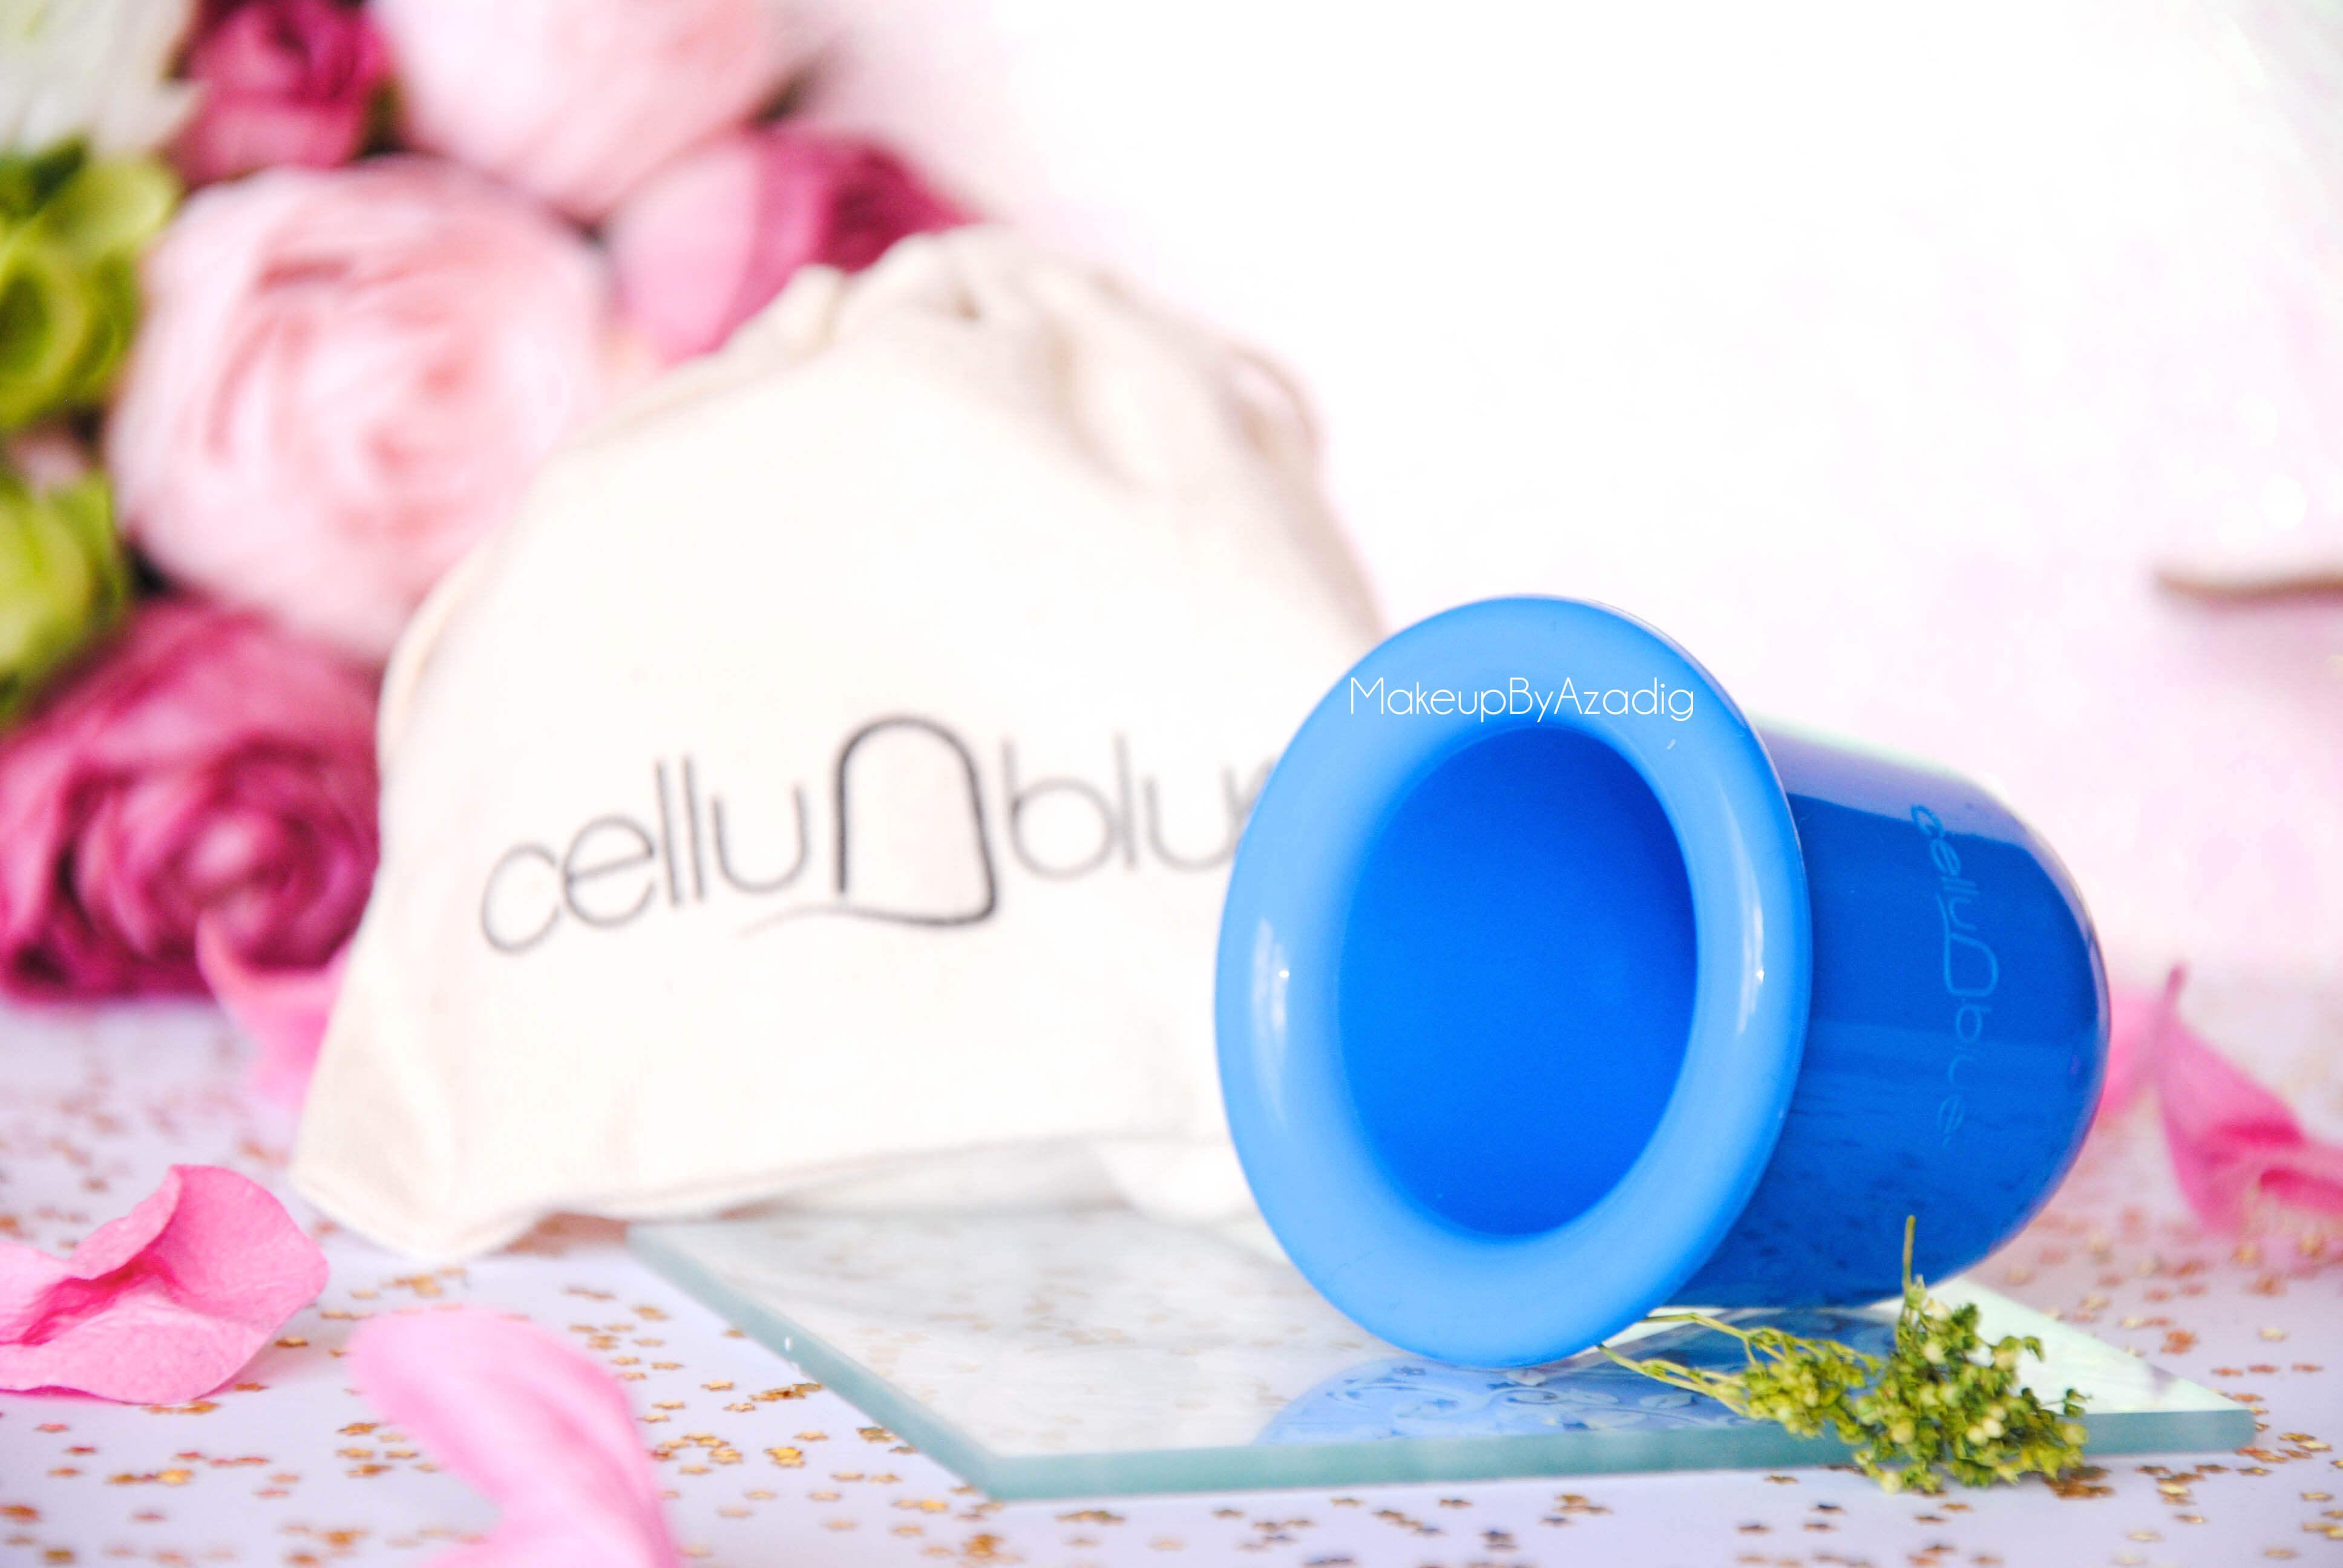 makeupbyazadig-cellublue-ventouse anti cellulite-avis-france